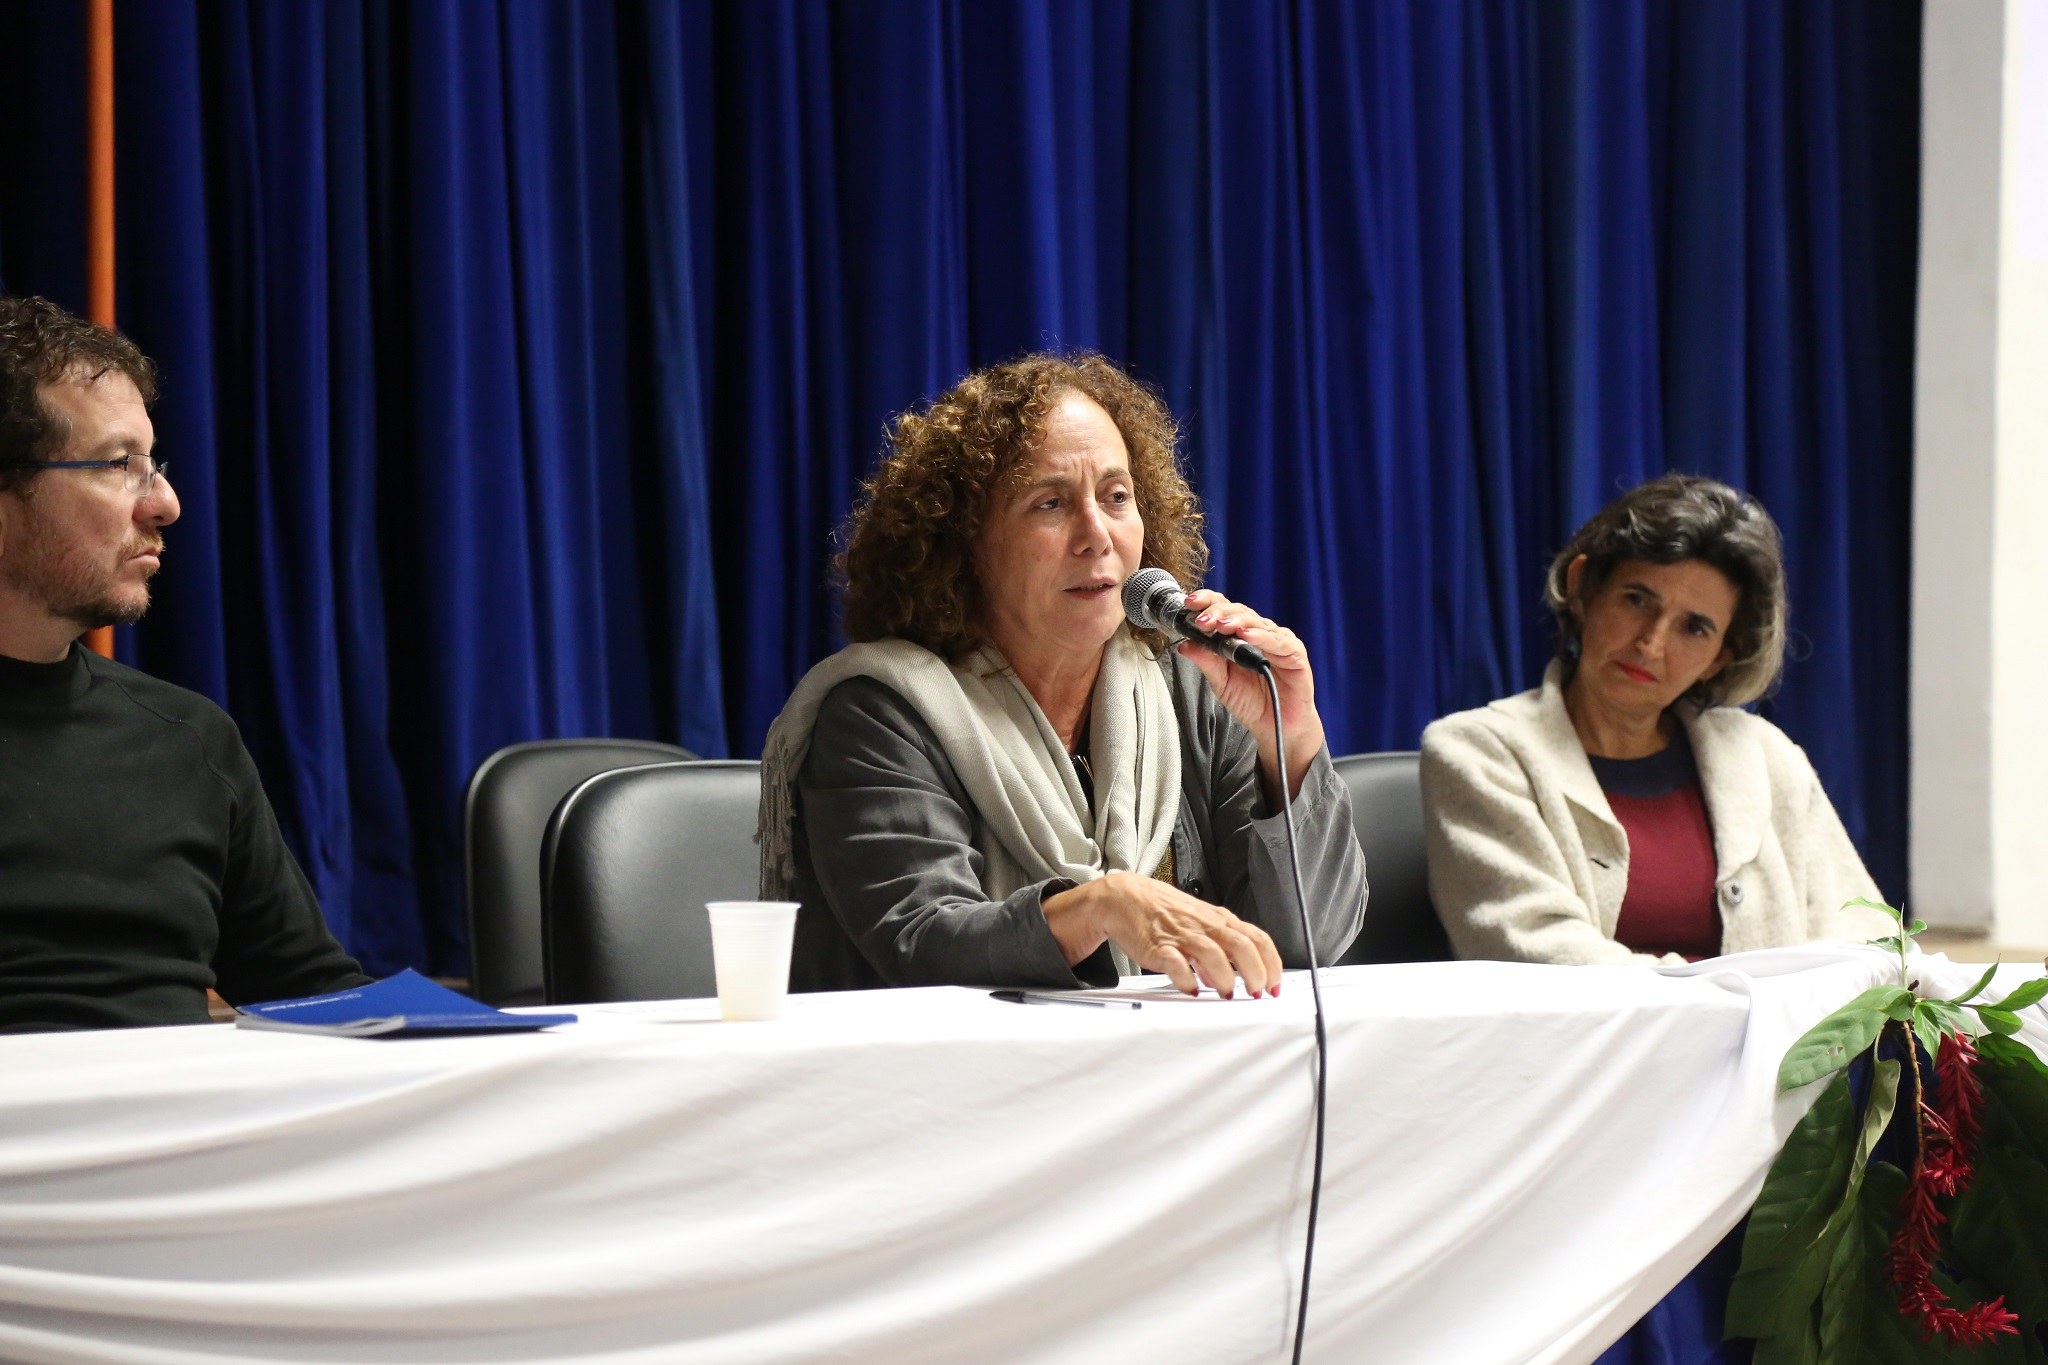 Vice-decana pro tempore do CFCHS, professora May Waddington